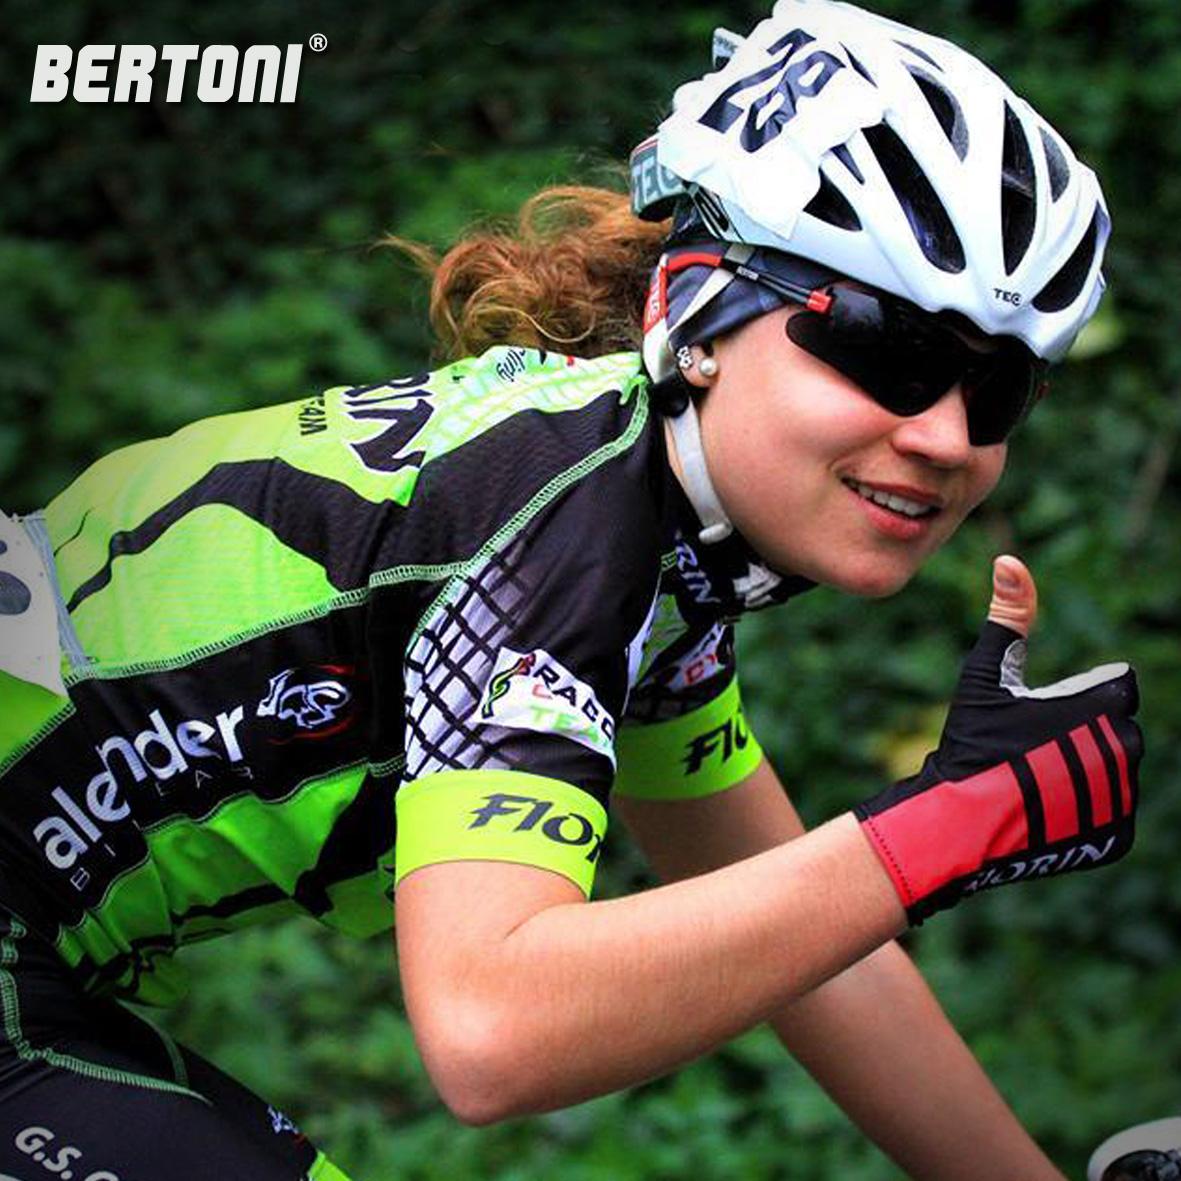 Team Fiorin - Ciclismo - Italia